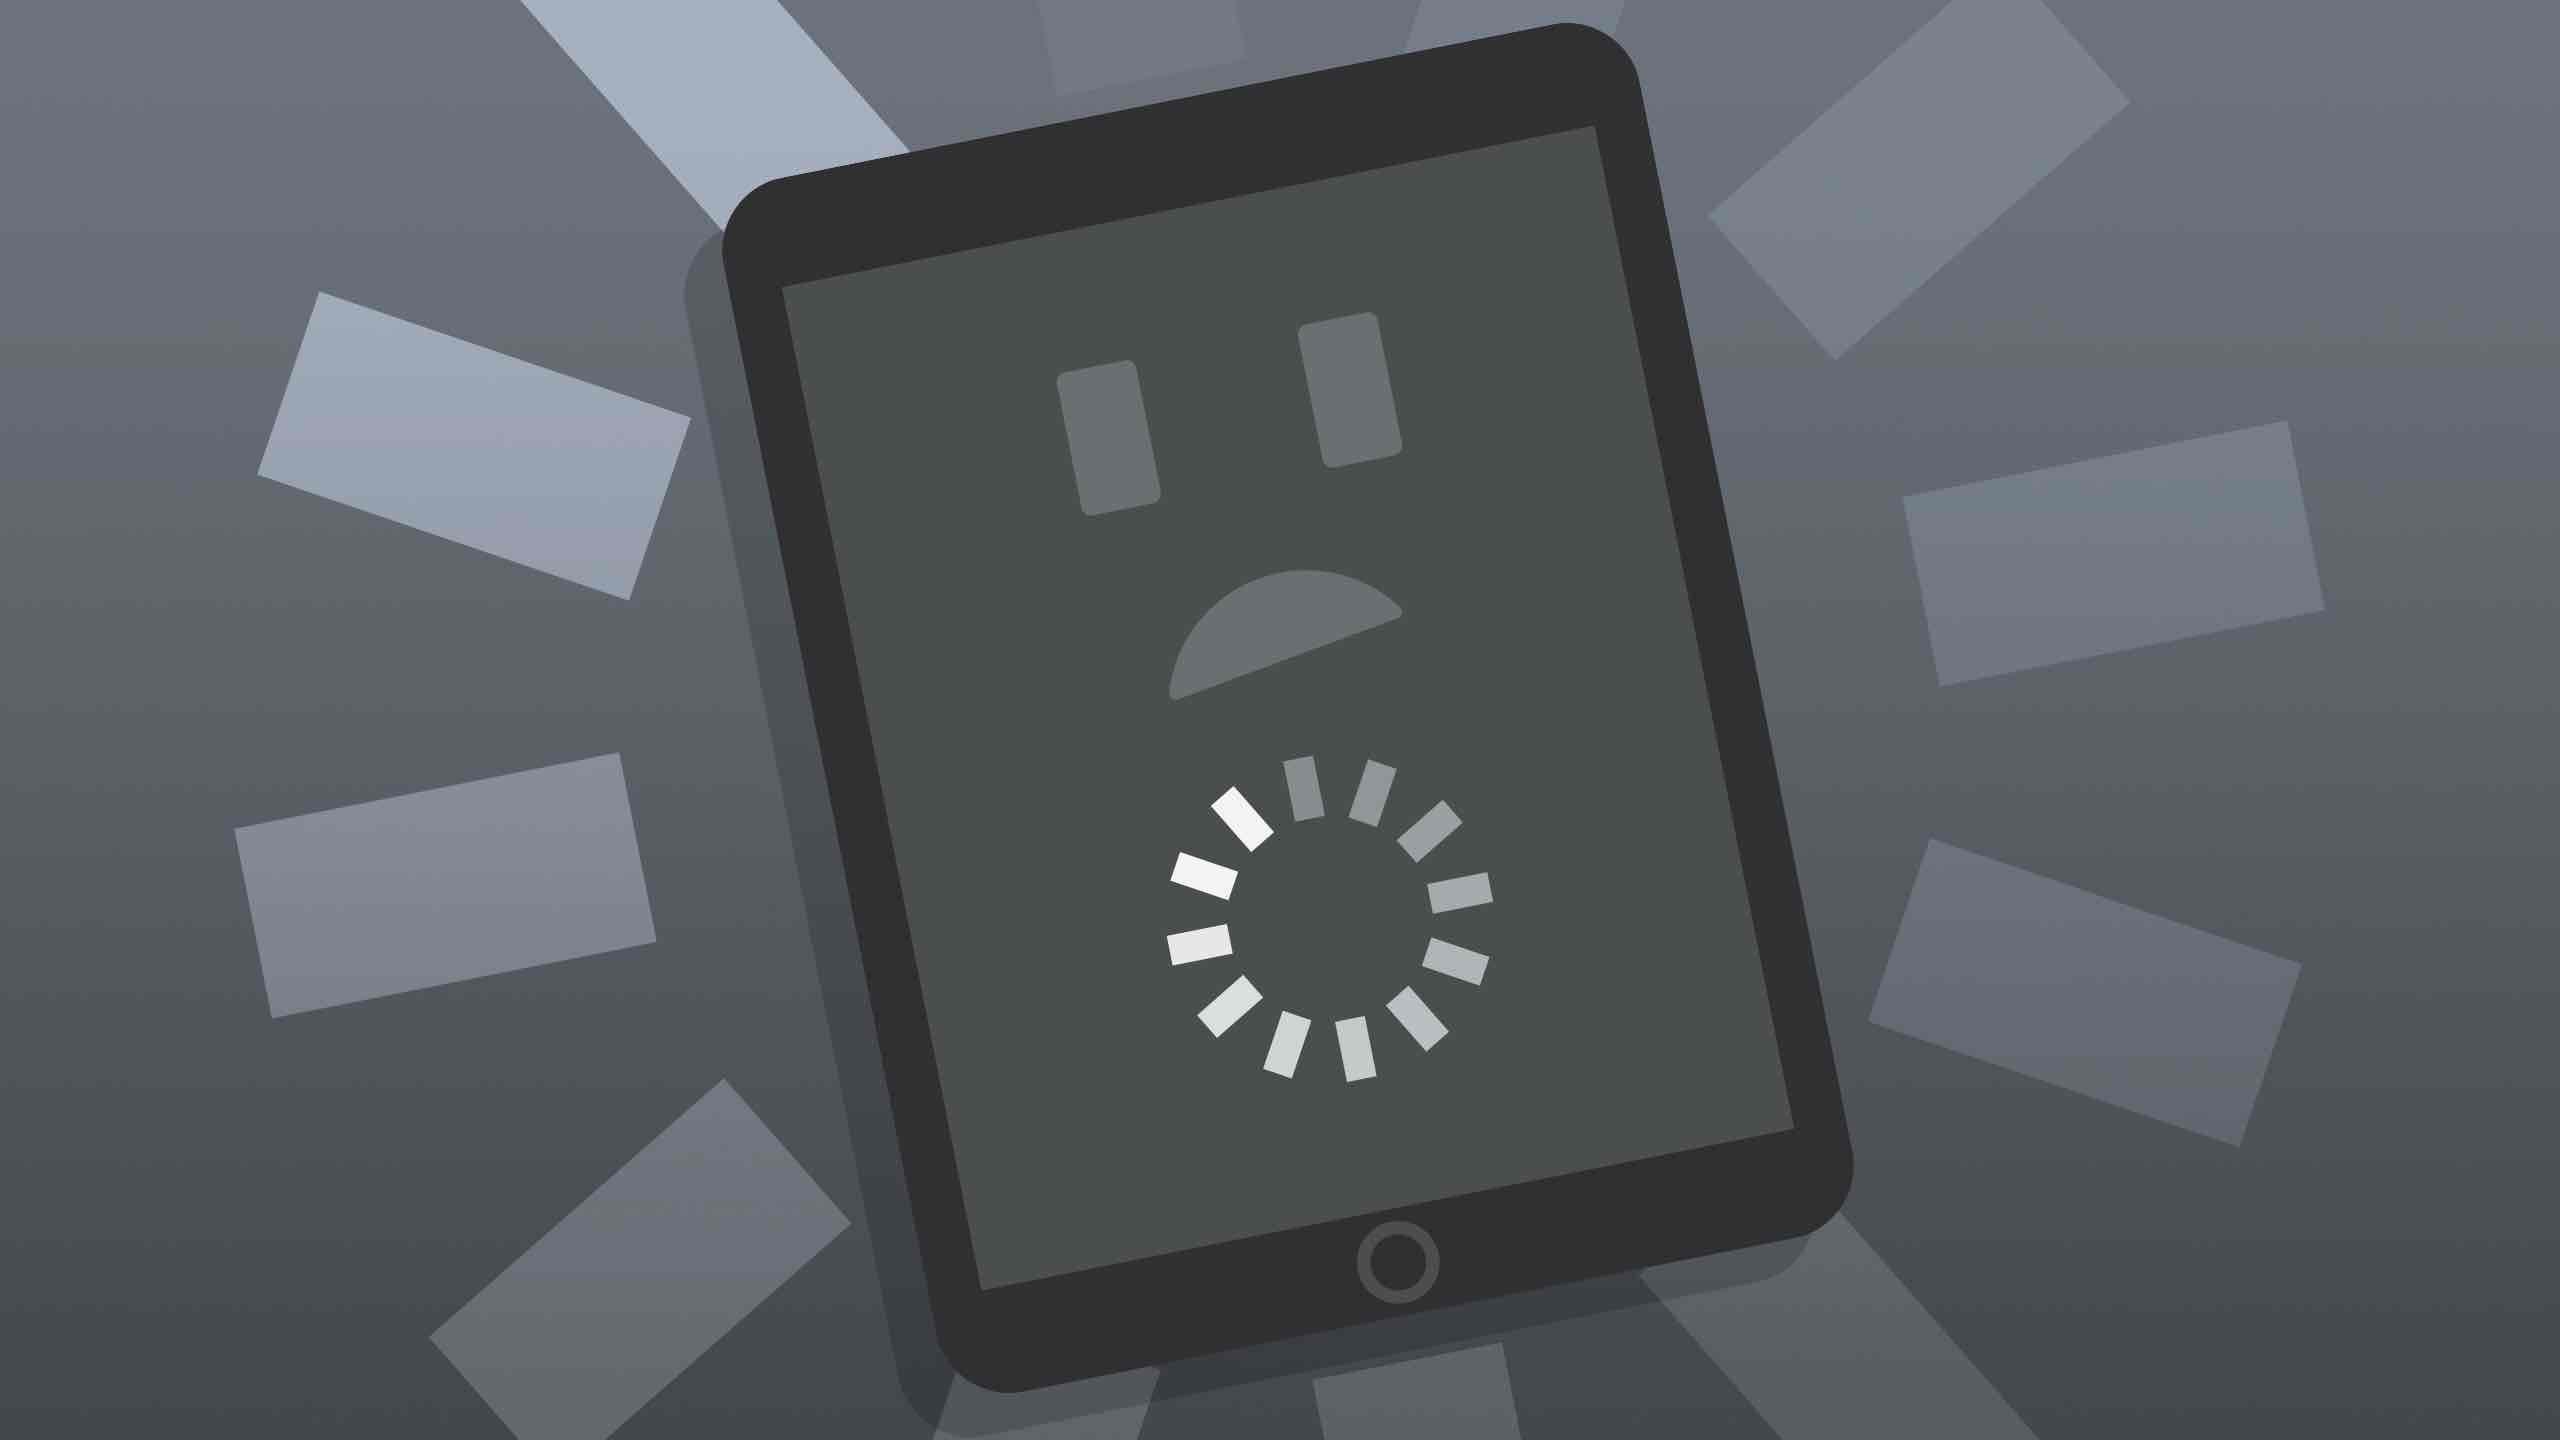 iPad Screen Keeps Freezing